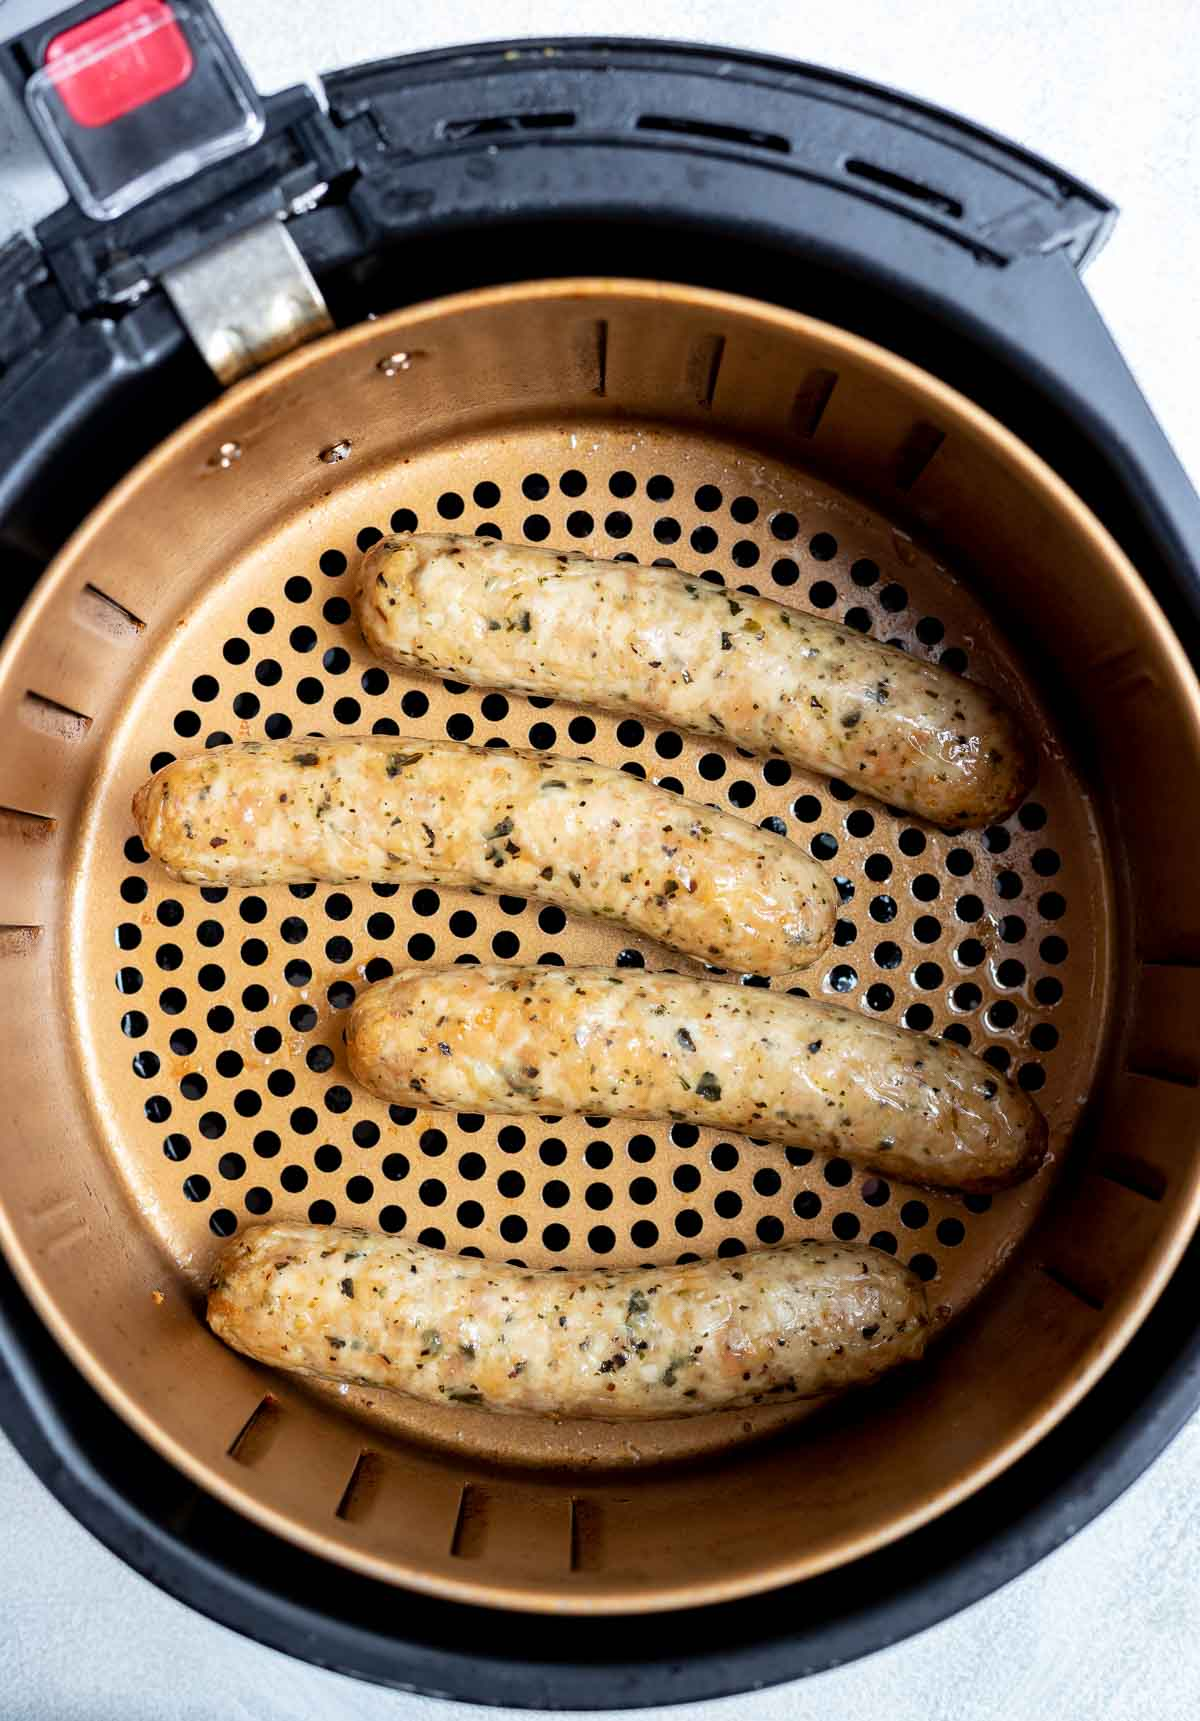 air fryer sausage in fryer basket